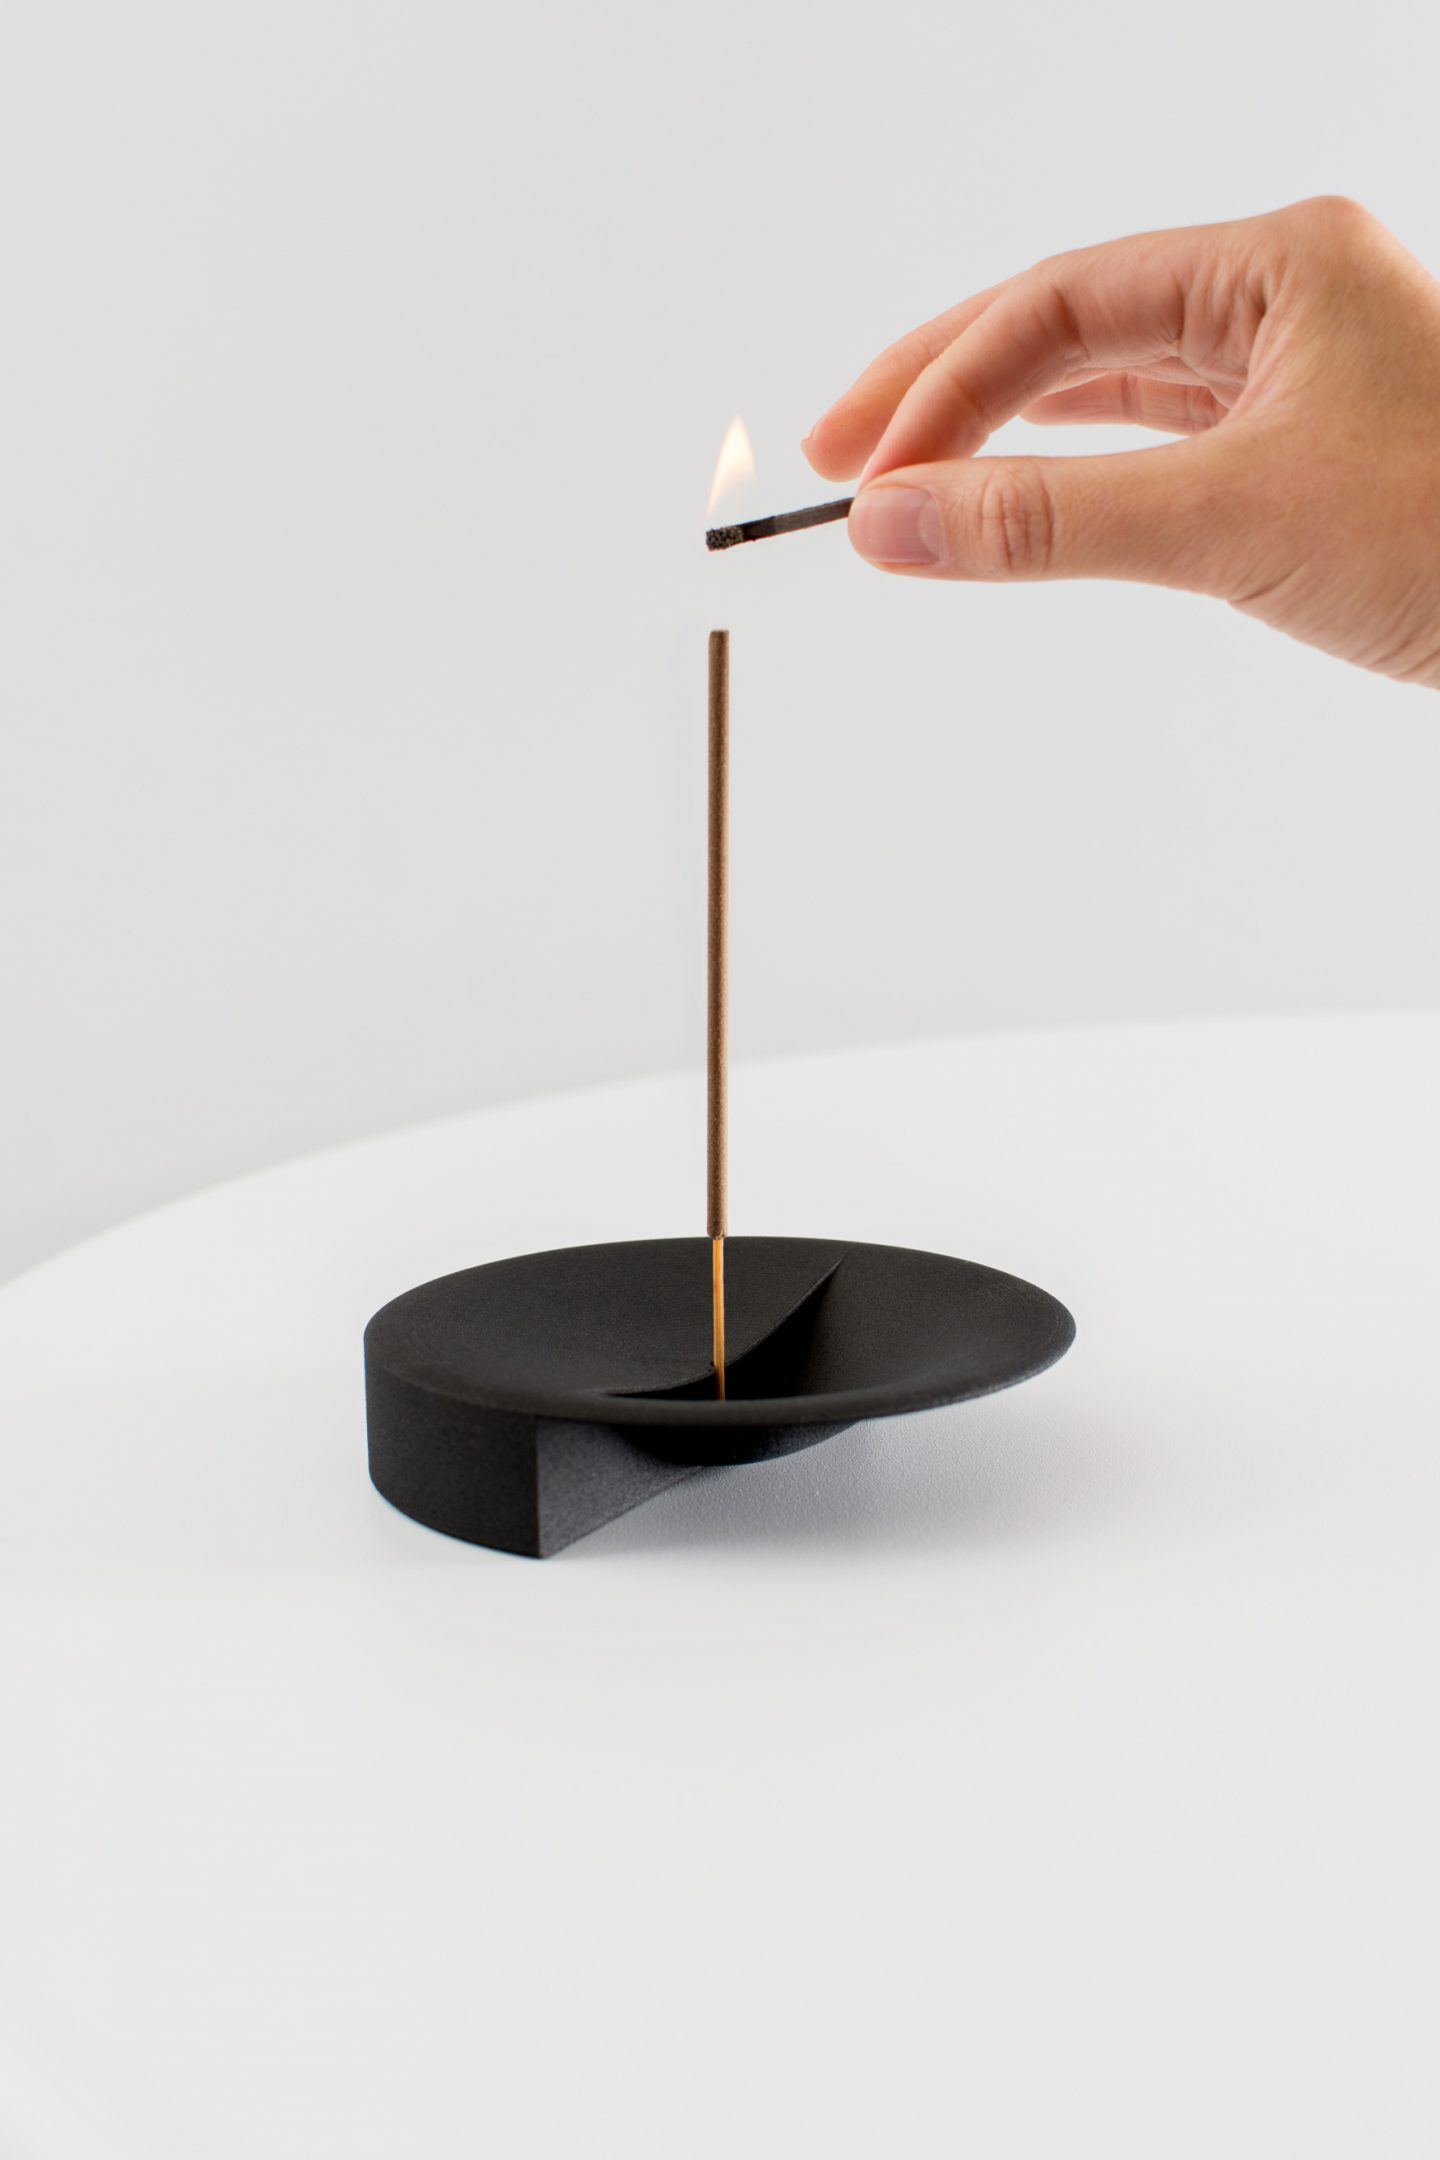 iGNANT-Design-Lukas-Peet-Scent-Tray-008